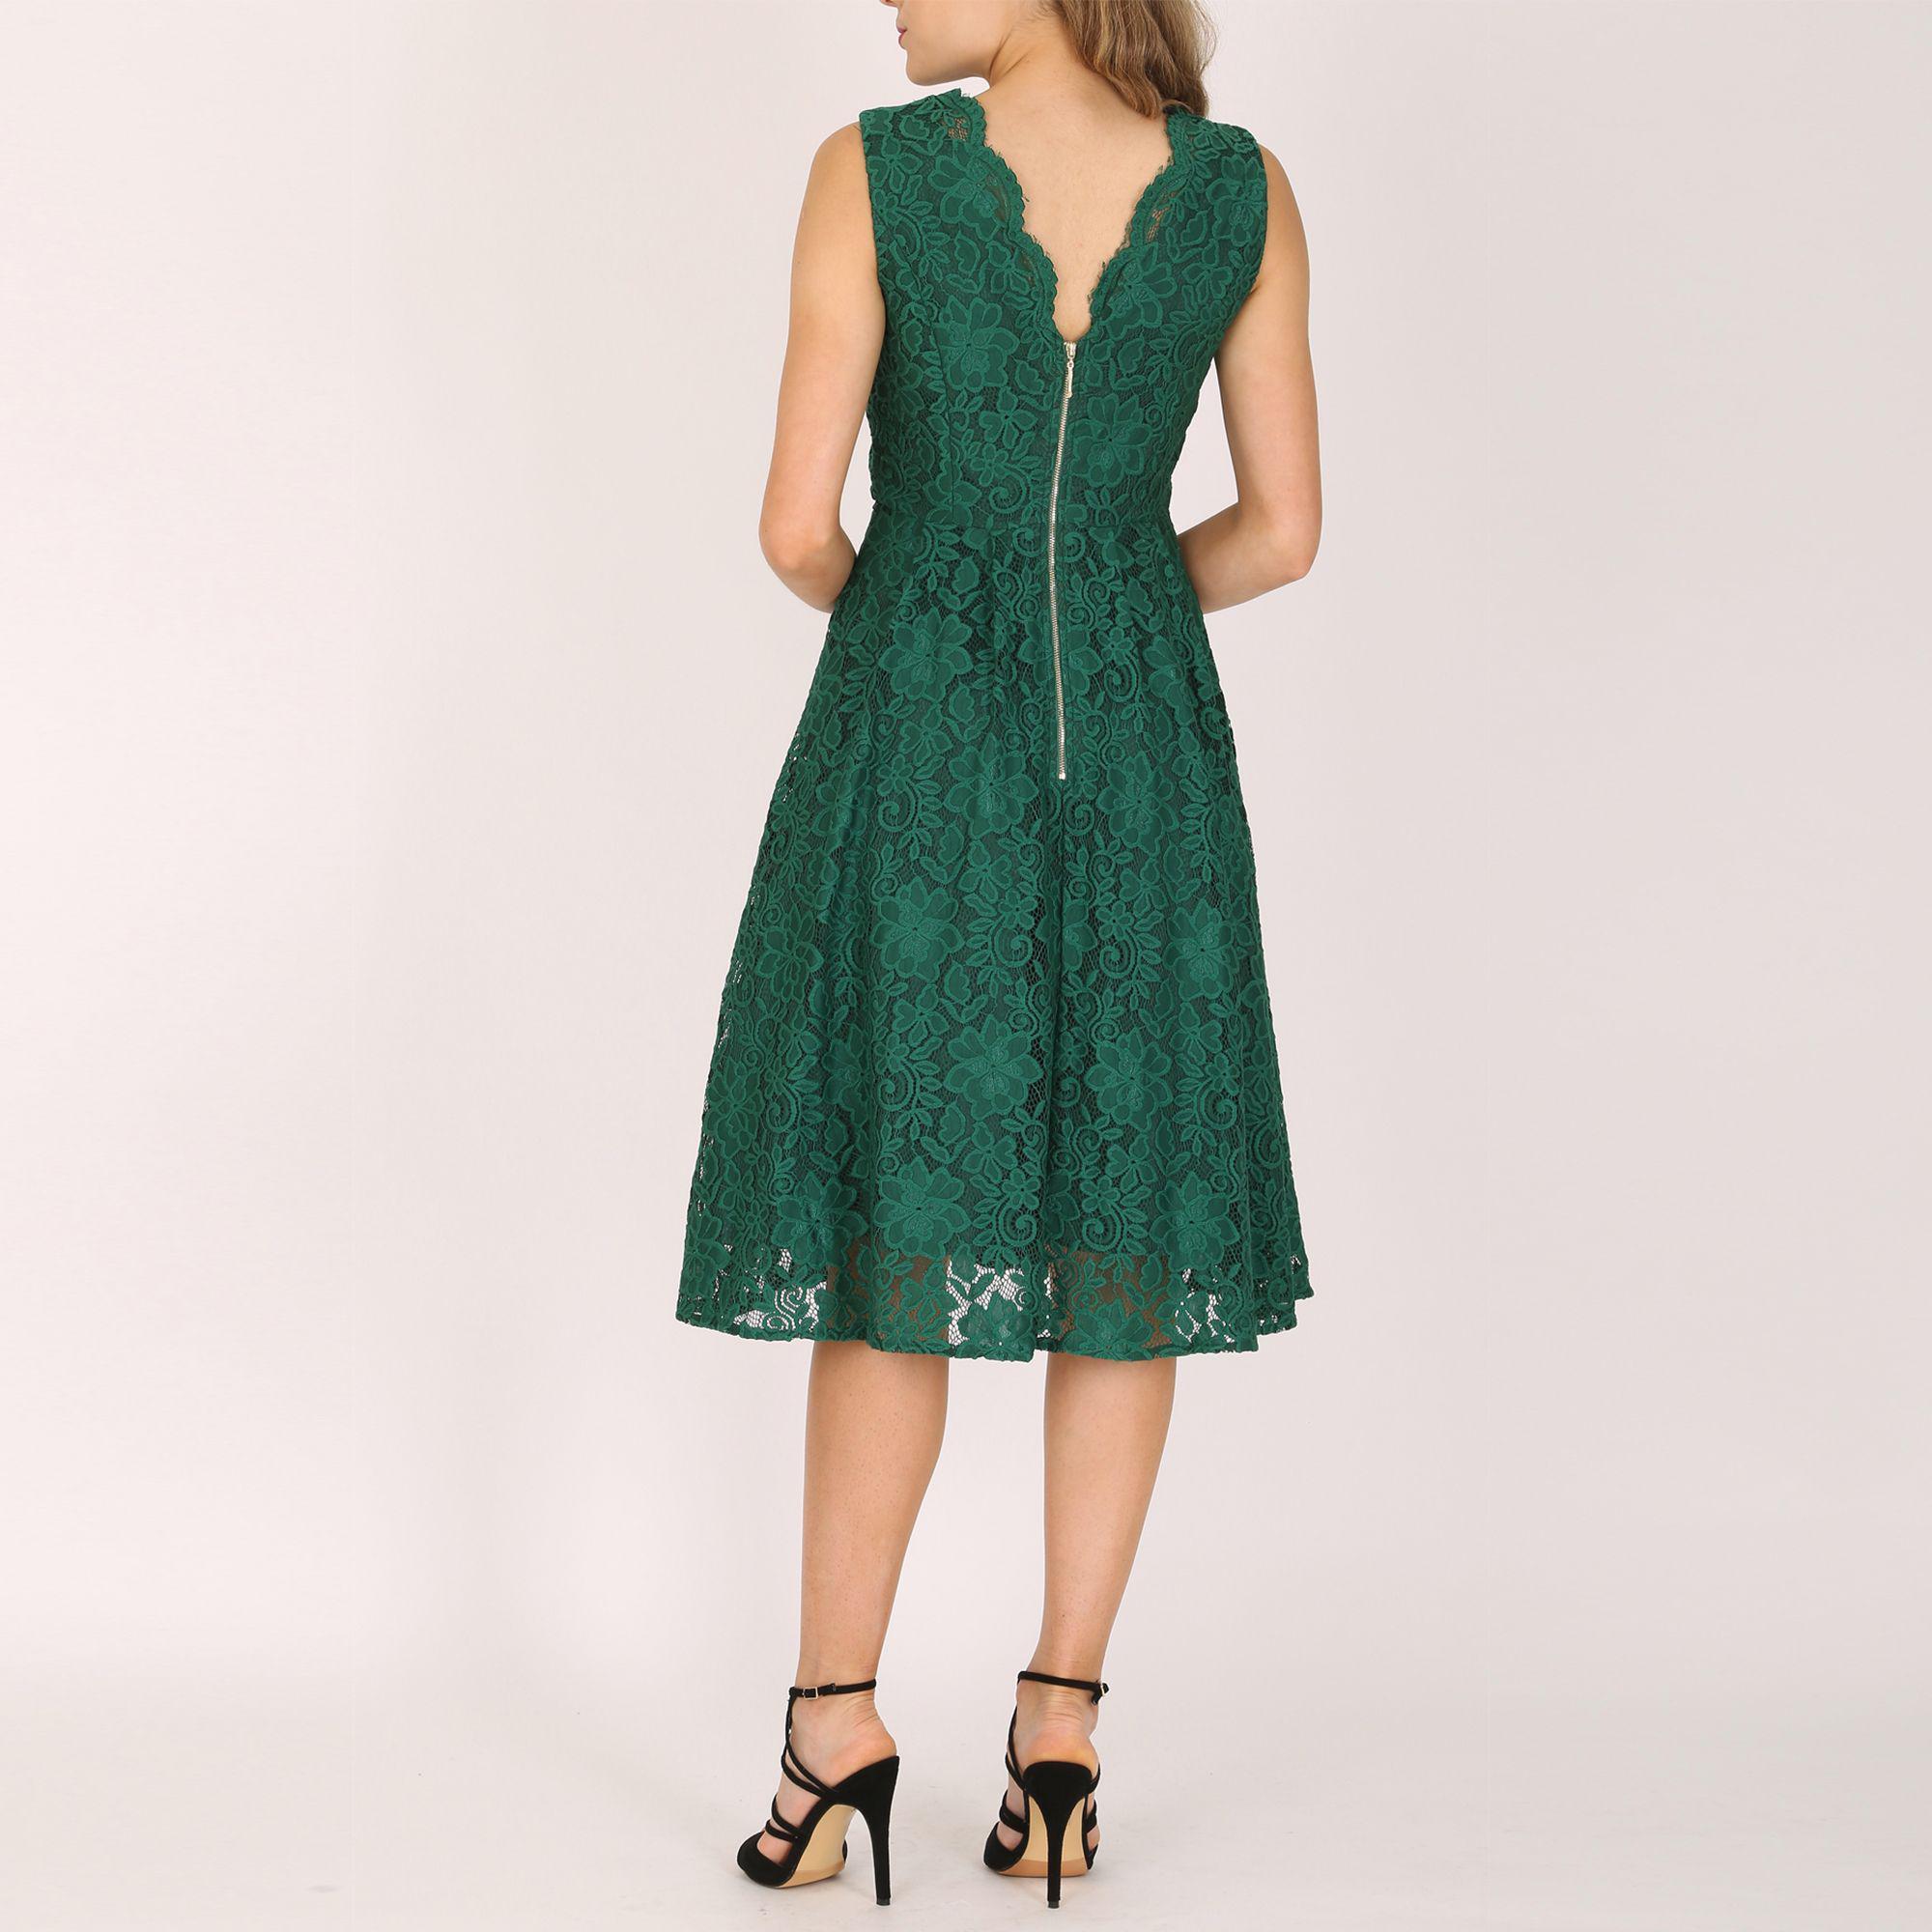 4302c53a116ca Jolie Moi Contrast Lace Bonded Shift Dress Cream - SG Solothurn